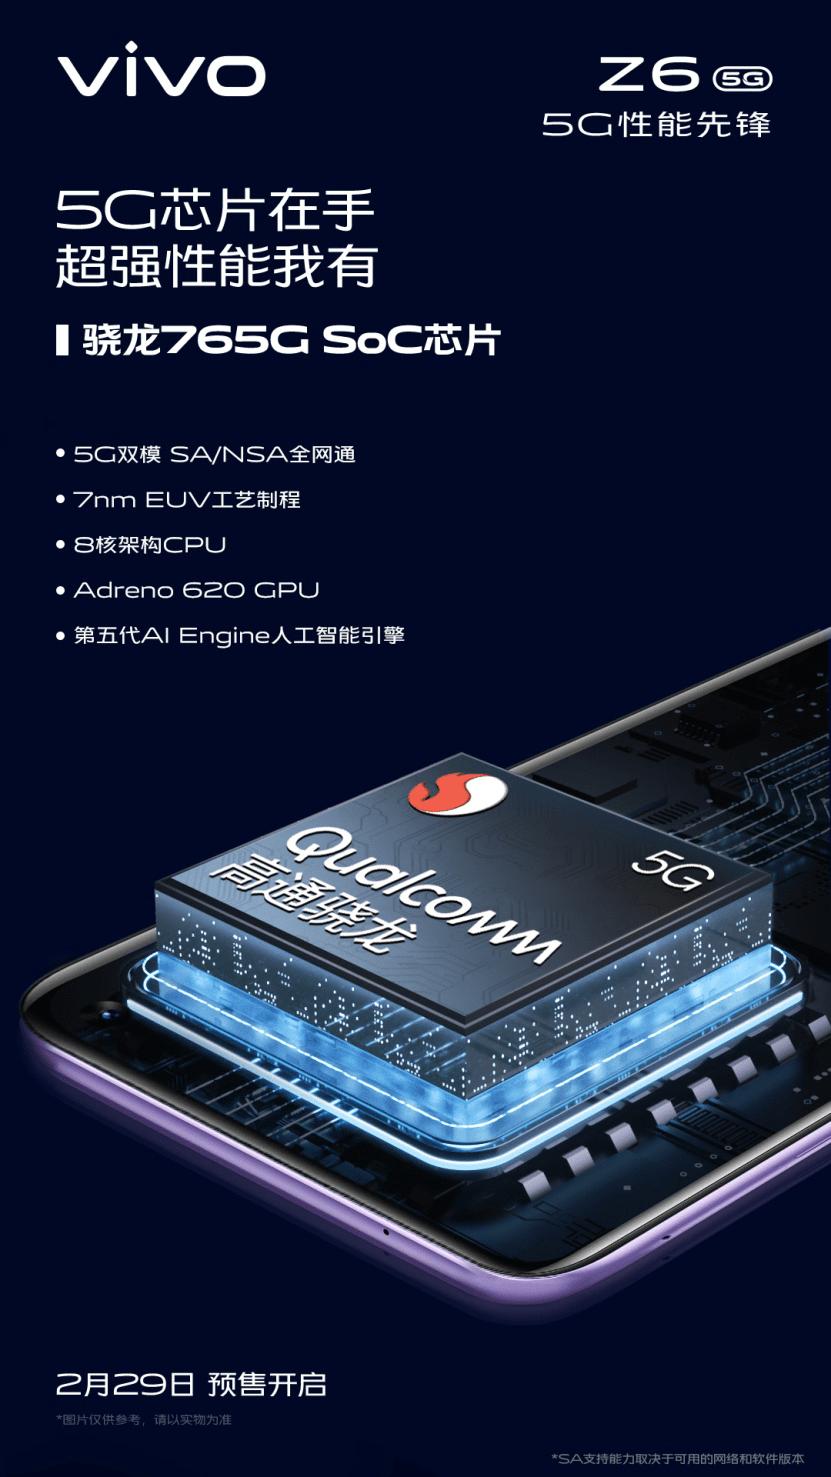 Vivo Z6 5G Chipset Details